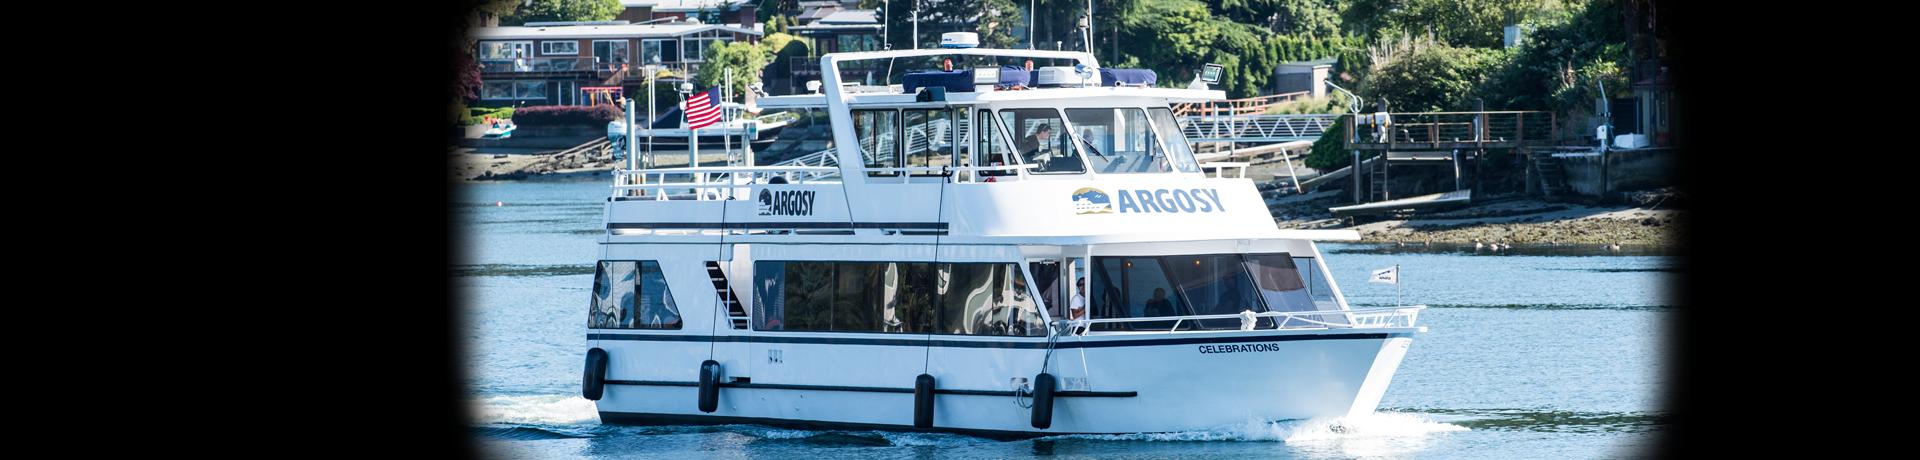 celebrations argosy cruises - Argosy Christmas Ships 2014